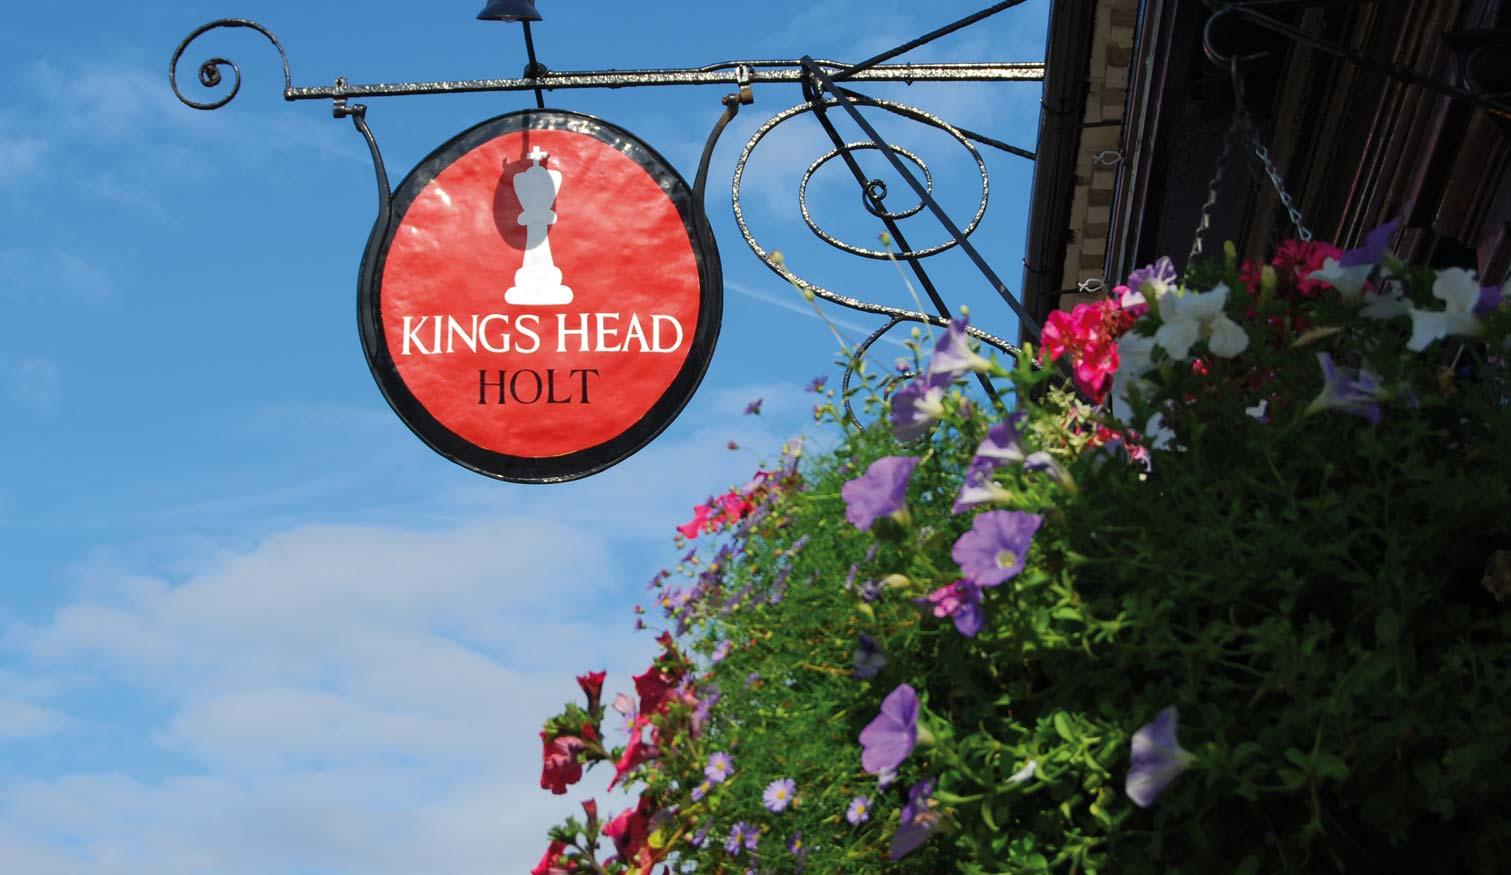 King's Head, Holt